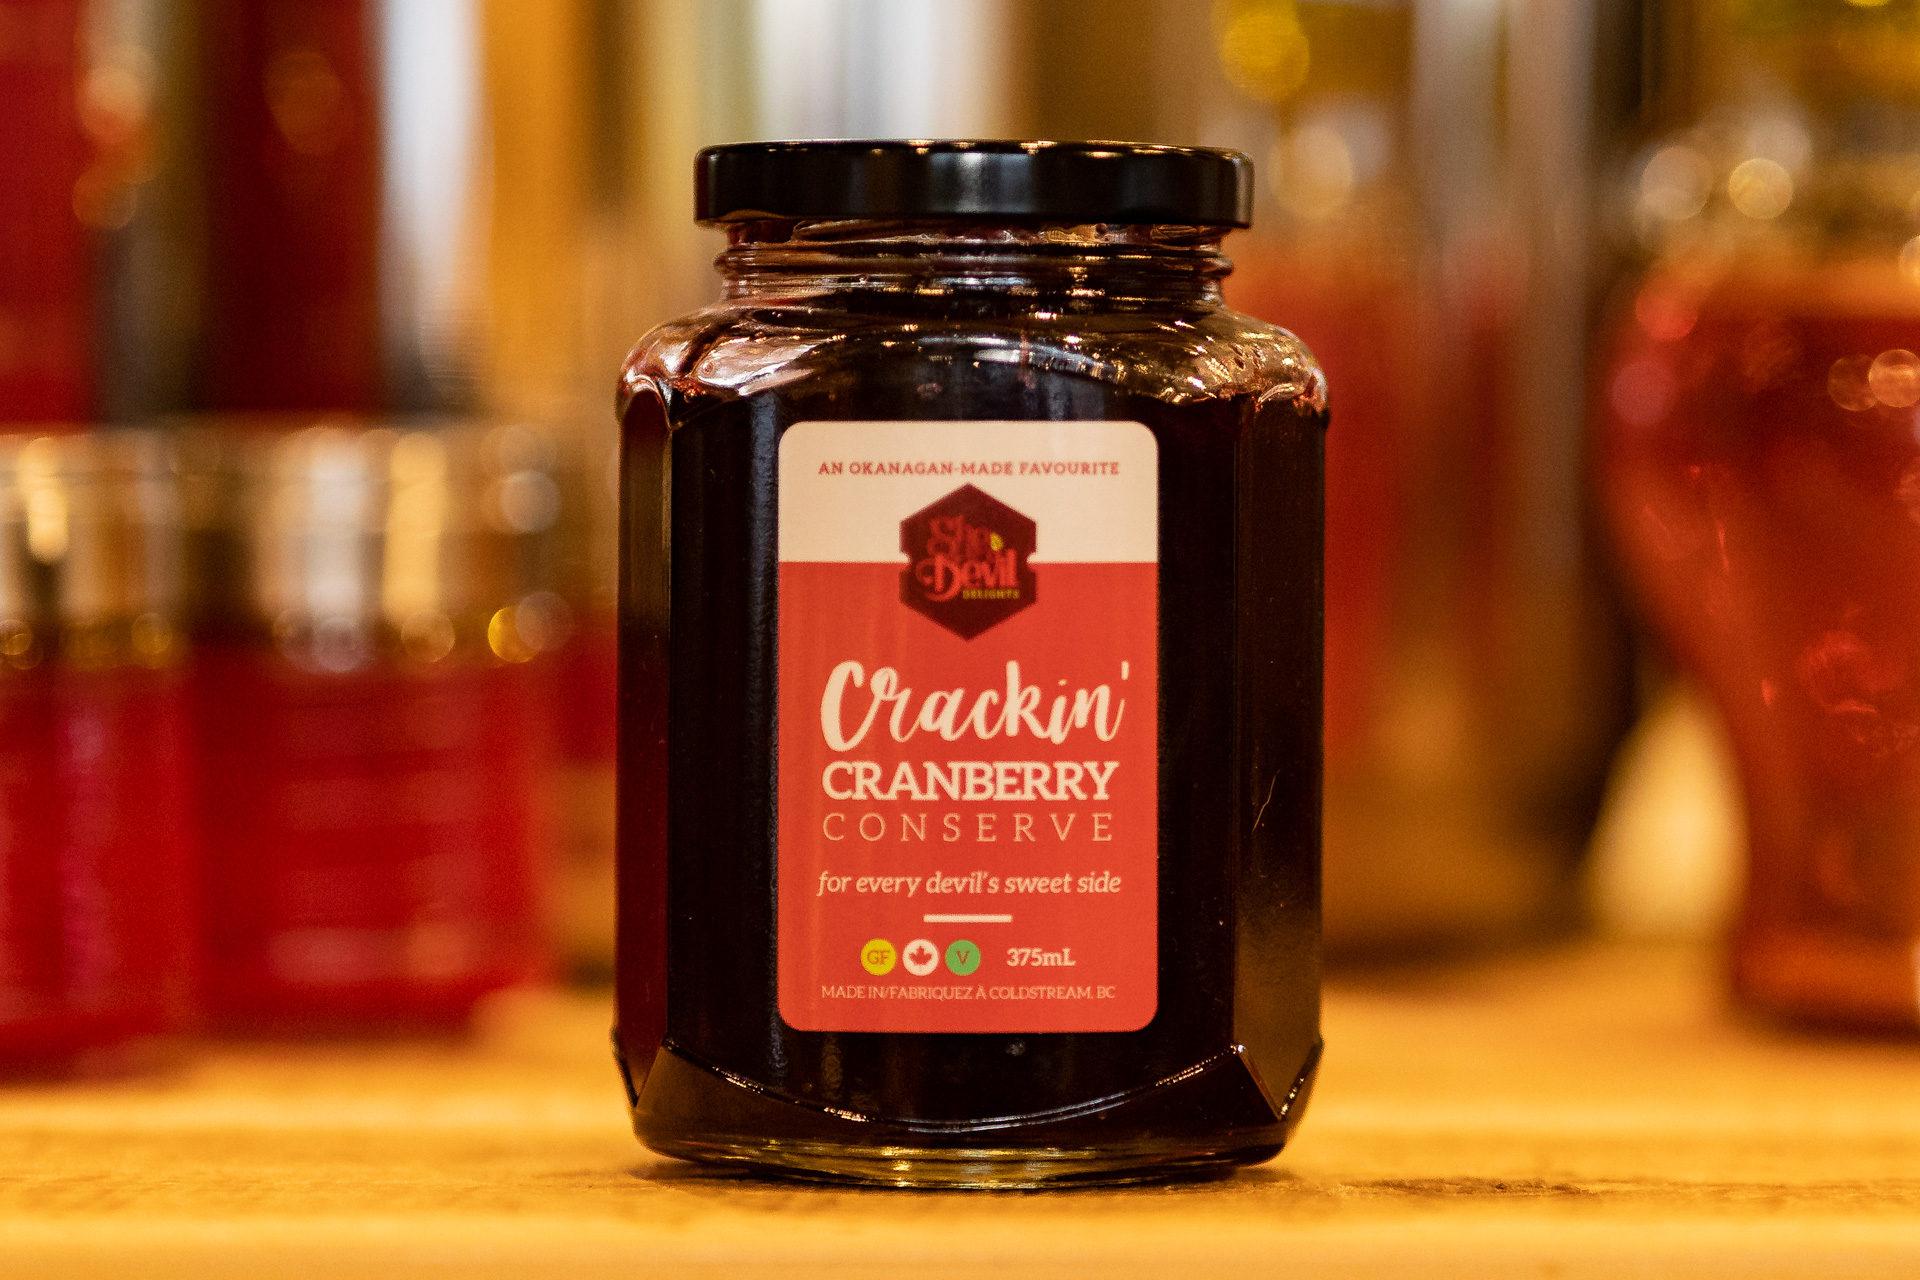 Crackin' Cranberry Conserve